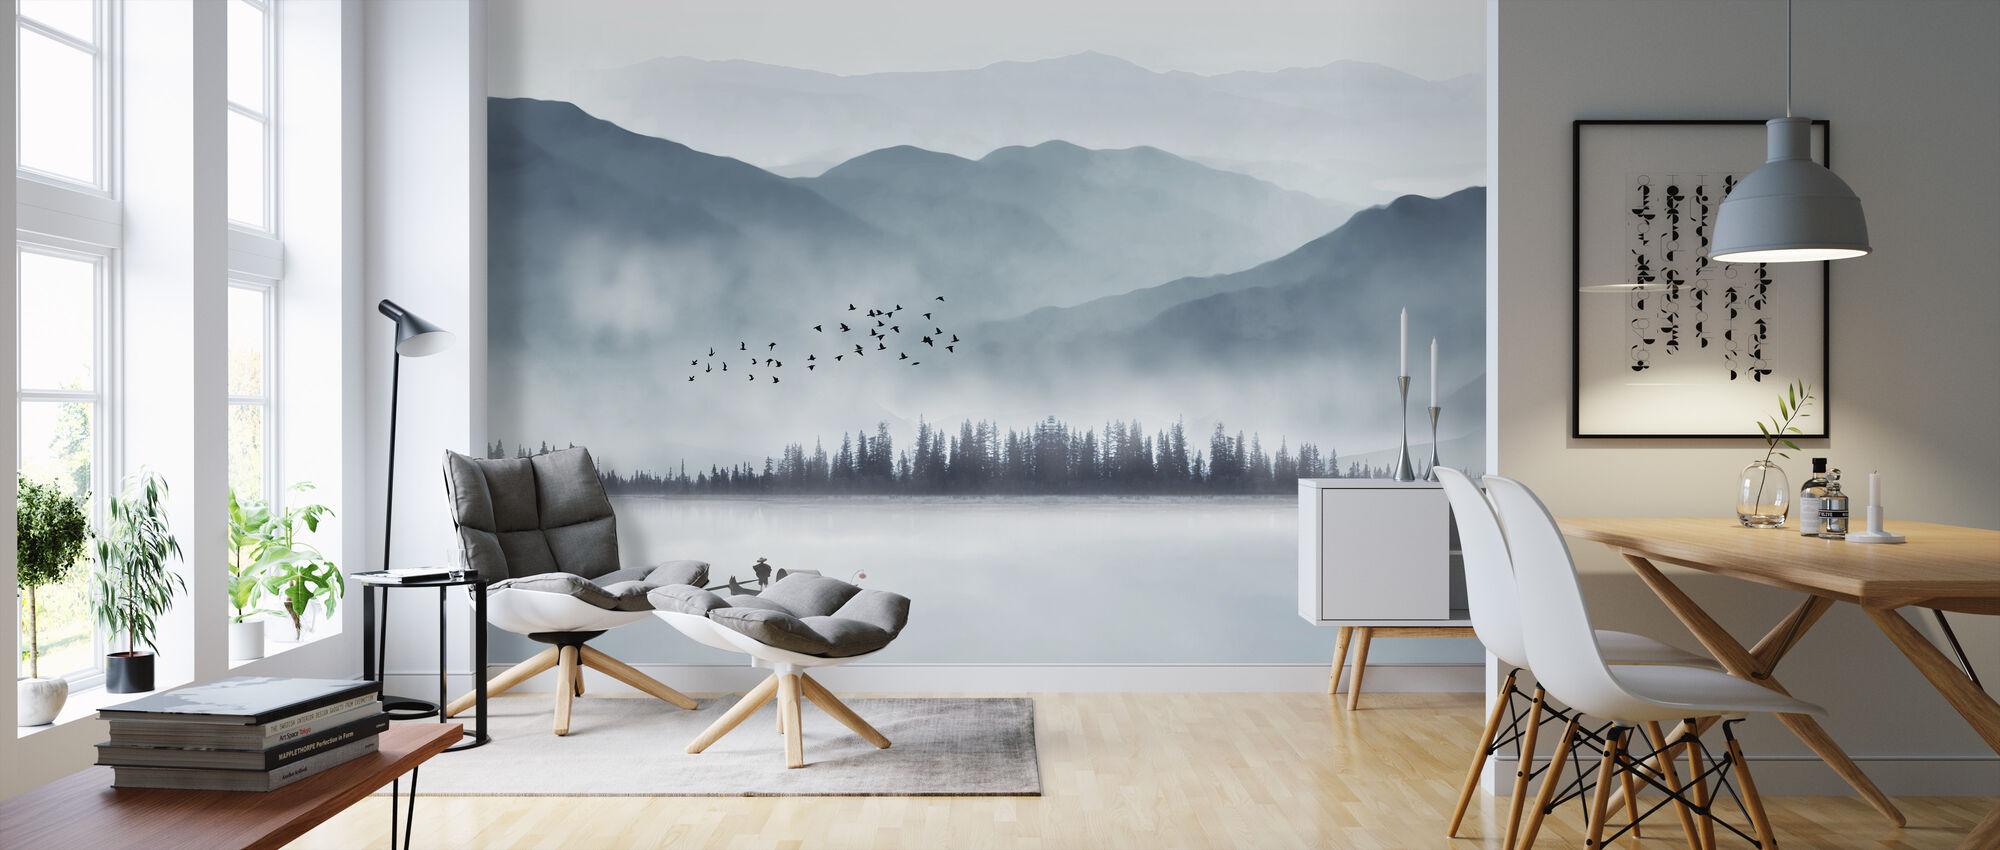 Fisherman - Wallpaper - Living Room